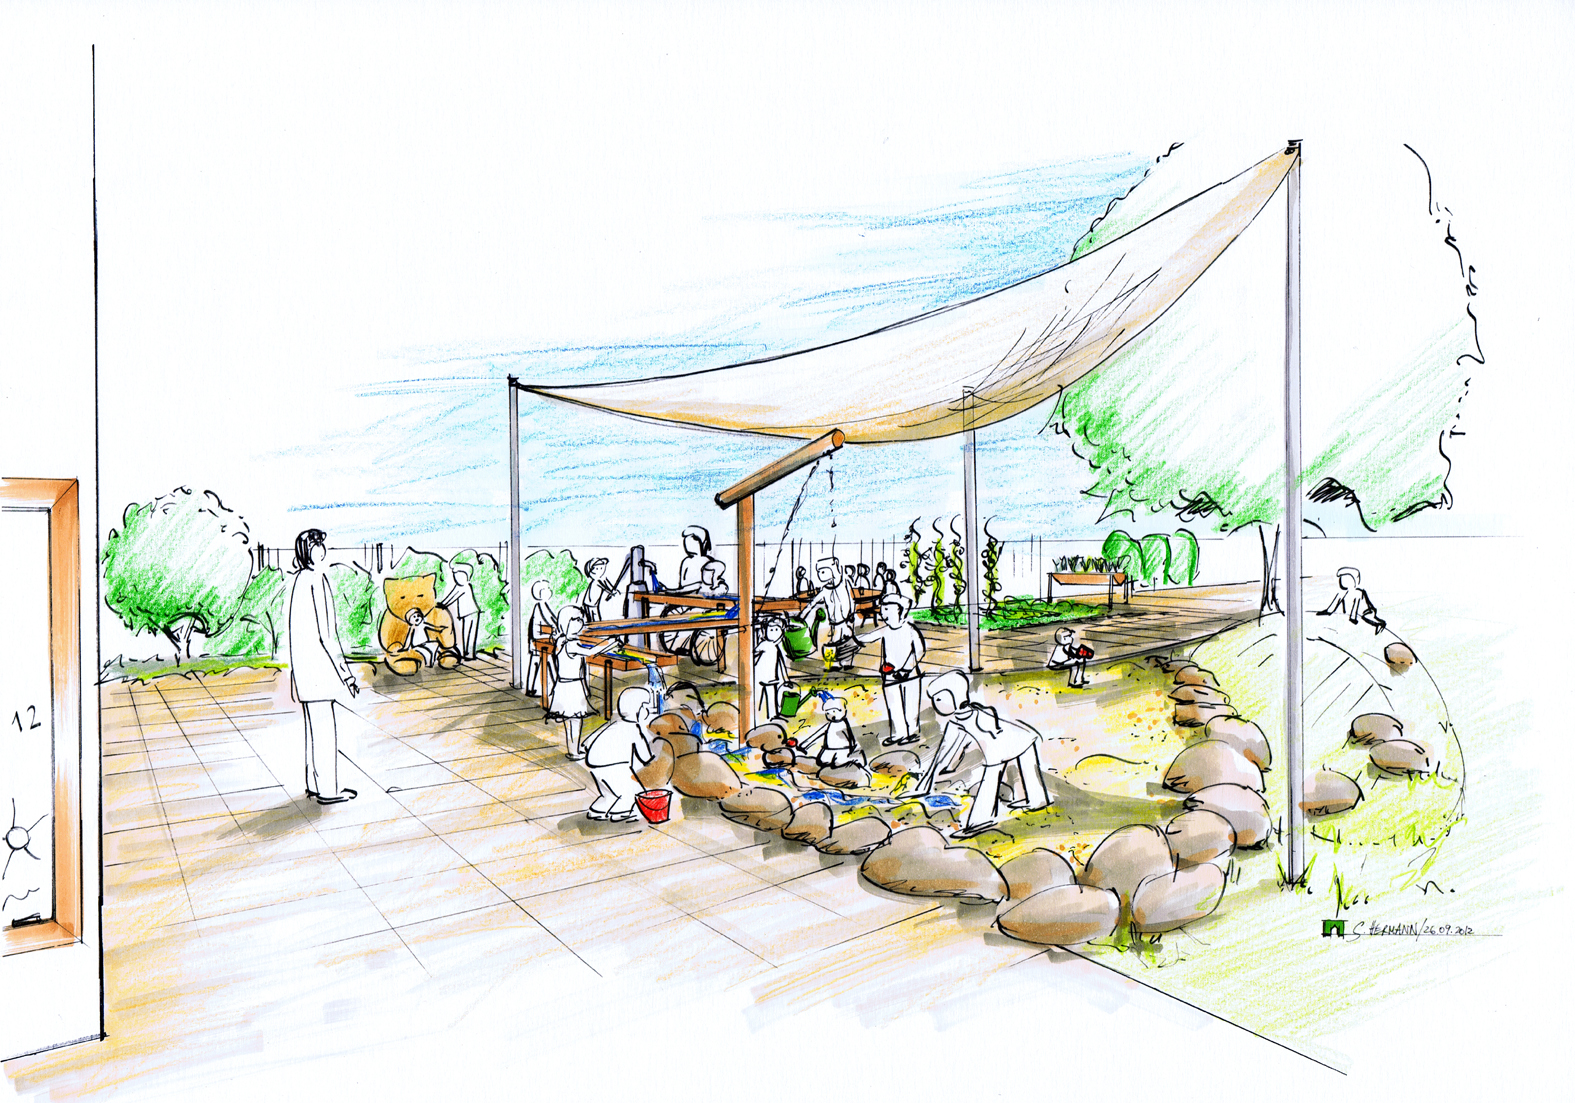 Planung 1 Integrative Kindertagesstätte Breinig